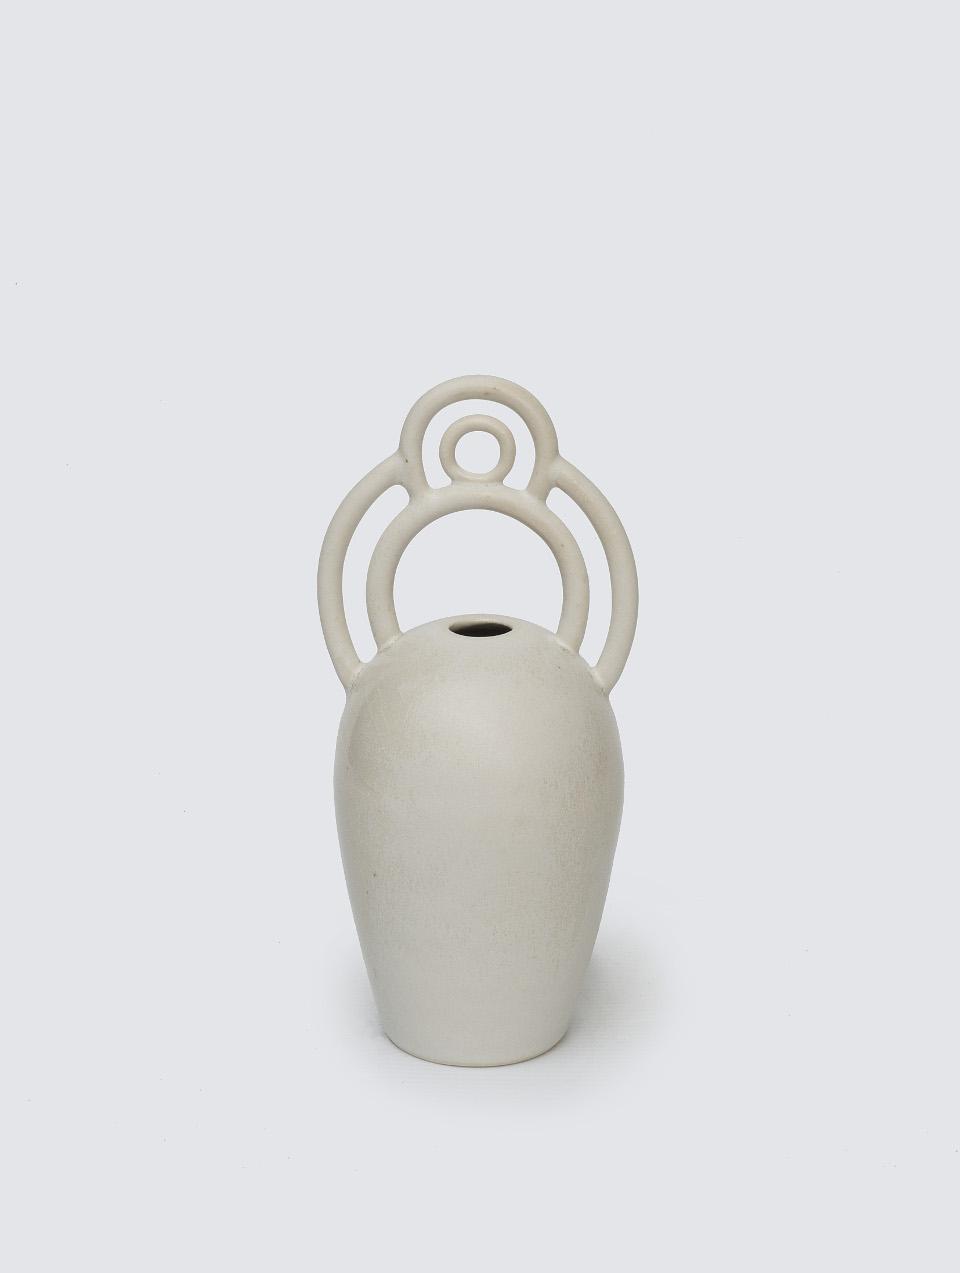 Intricate Symbol Vase (White), 2017